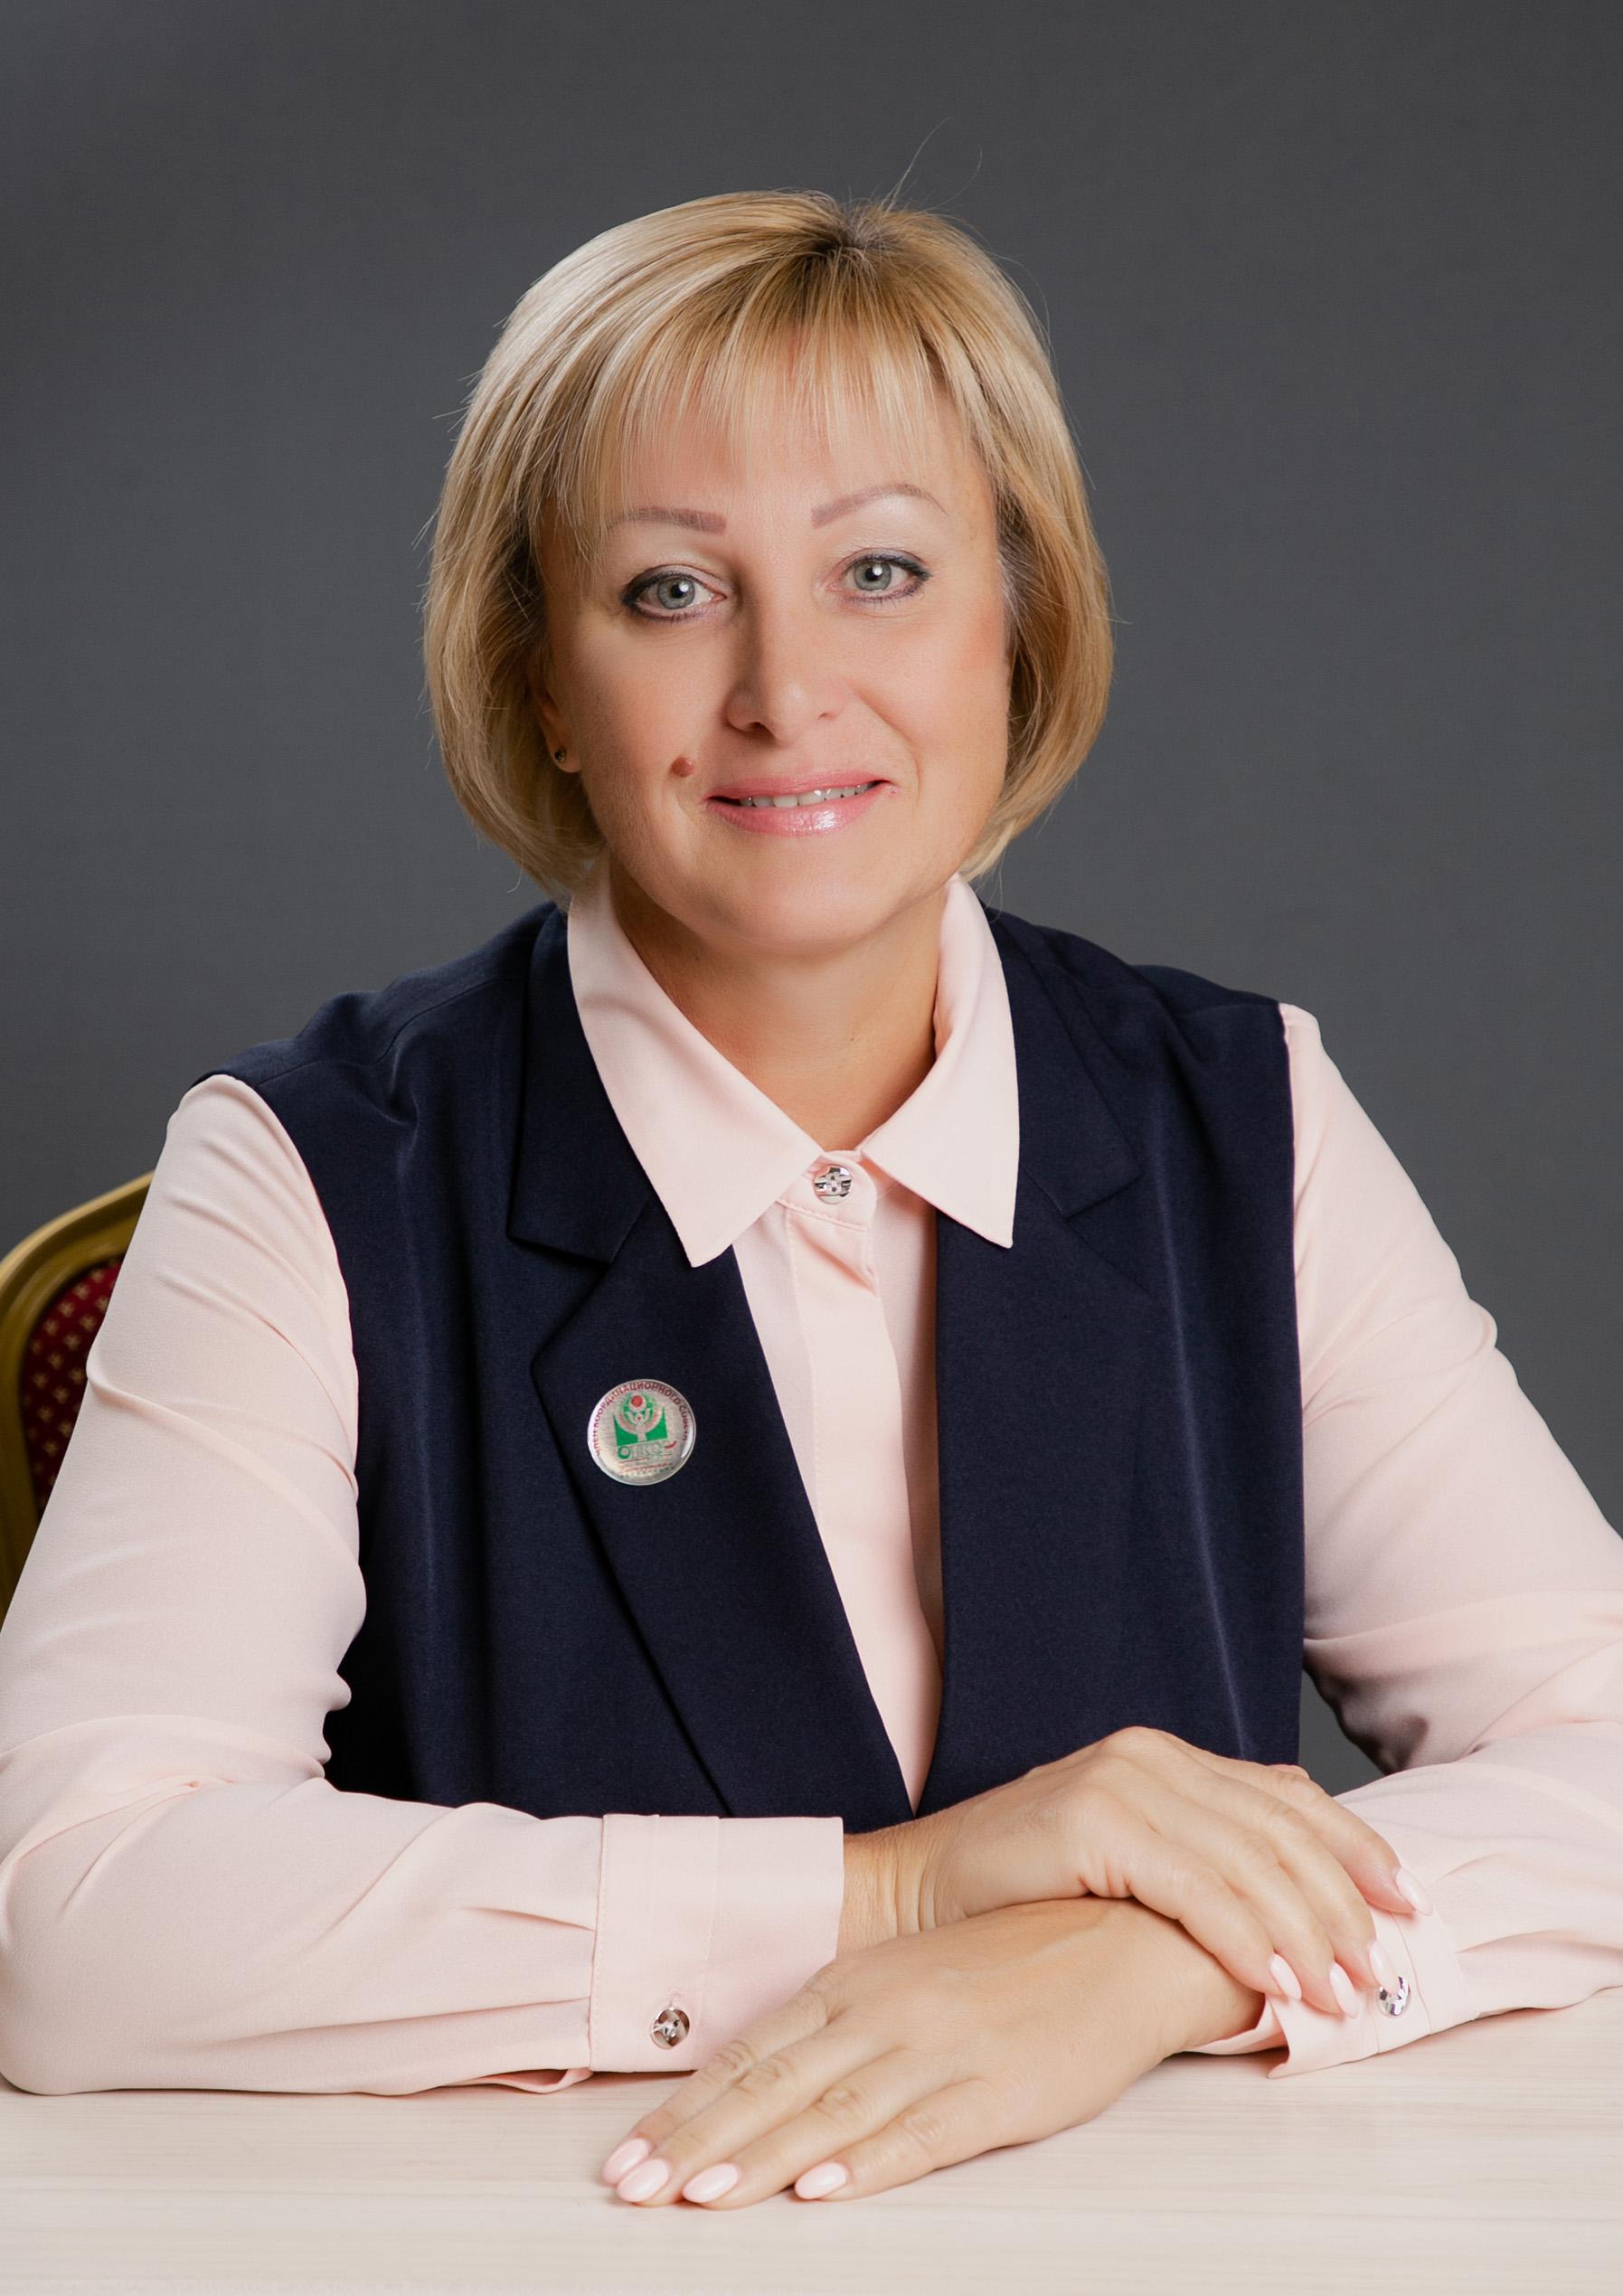 Дацюк Светлана Федоровна